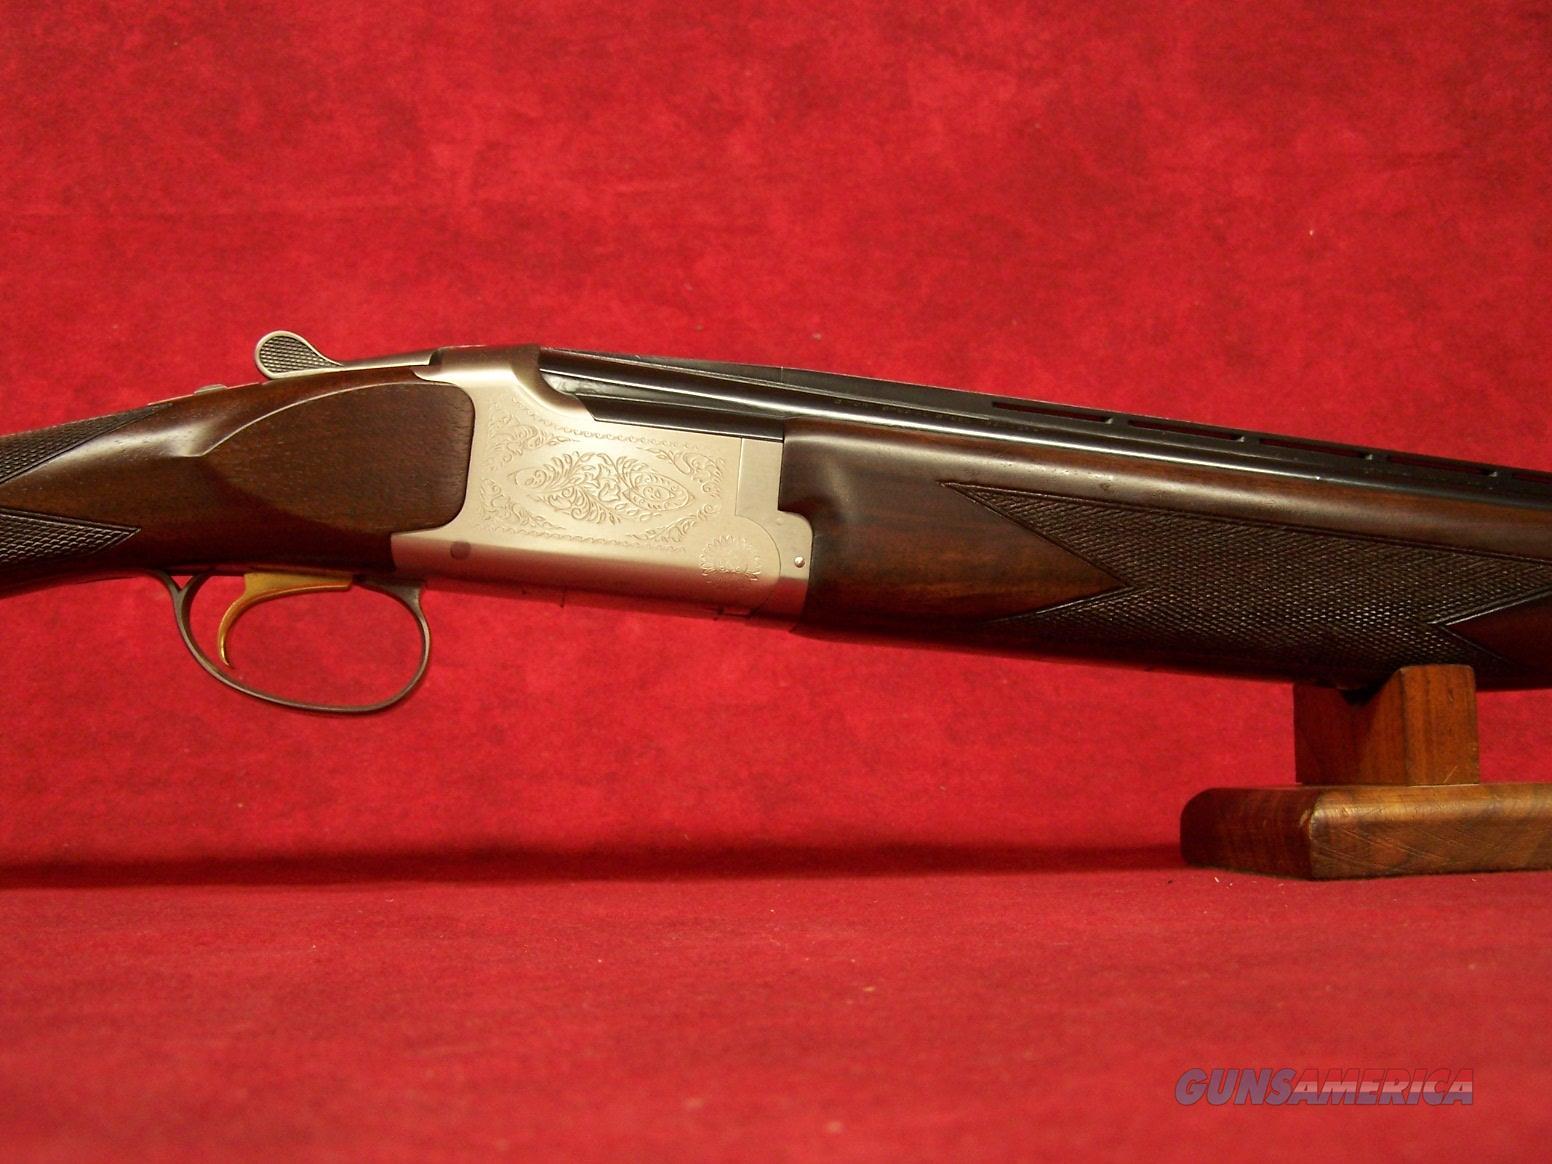 "Browning Citori Feather Superlight 16ga 2.75"" Chamber 28"" Barrel (018197513)  Guns > Shotguns > Browning Shotguns > Over Unders > Citori > Hunting"